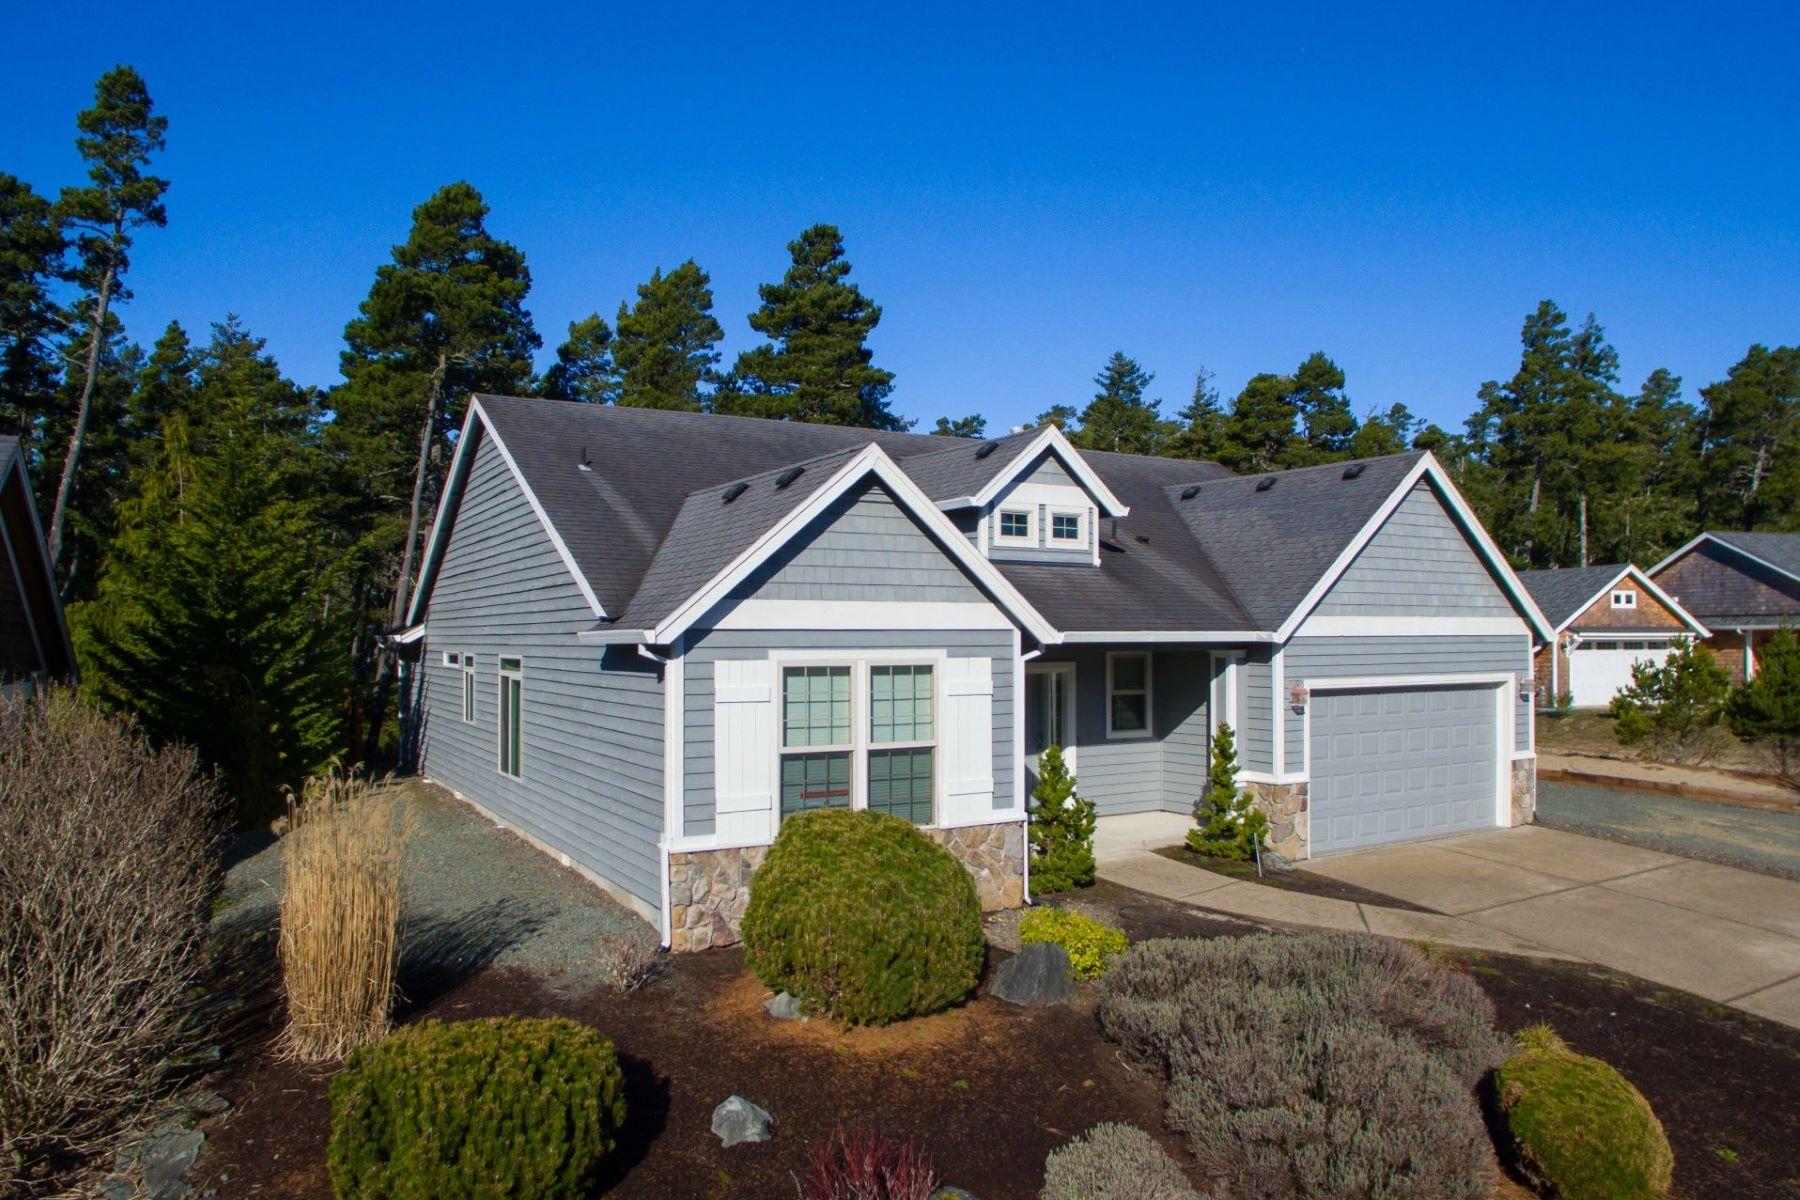 Other Residential Homes για την Πώληση στο 10140 PINE RIDGE DR Manzanita, OR 97130 10140 Pine Ridge Dr., Manzanita, Ορεγκον 97130 Ηνωμένες Πολιτείες